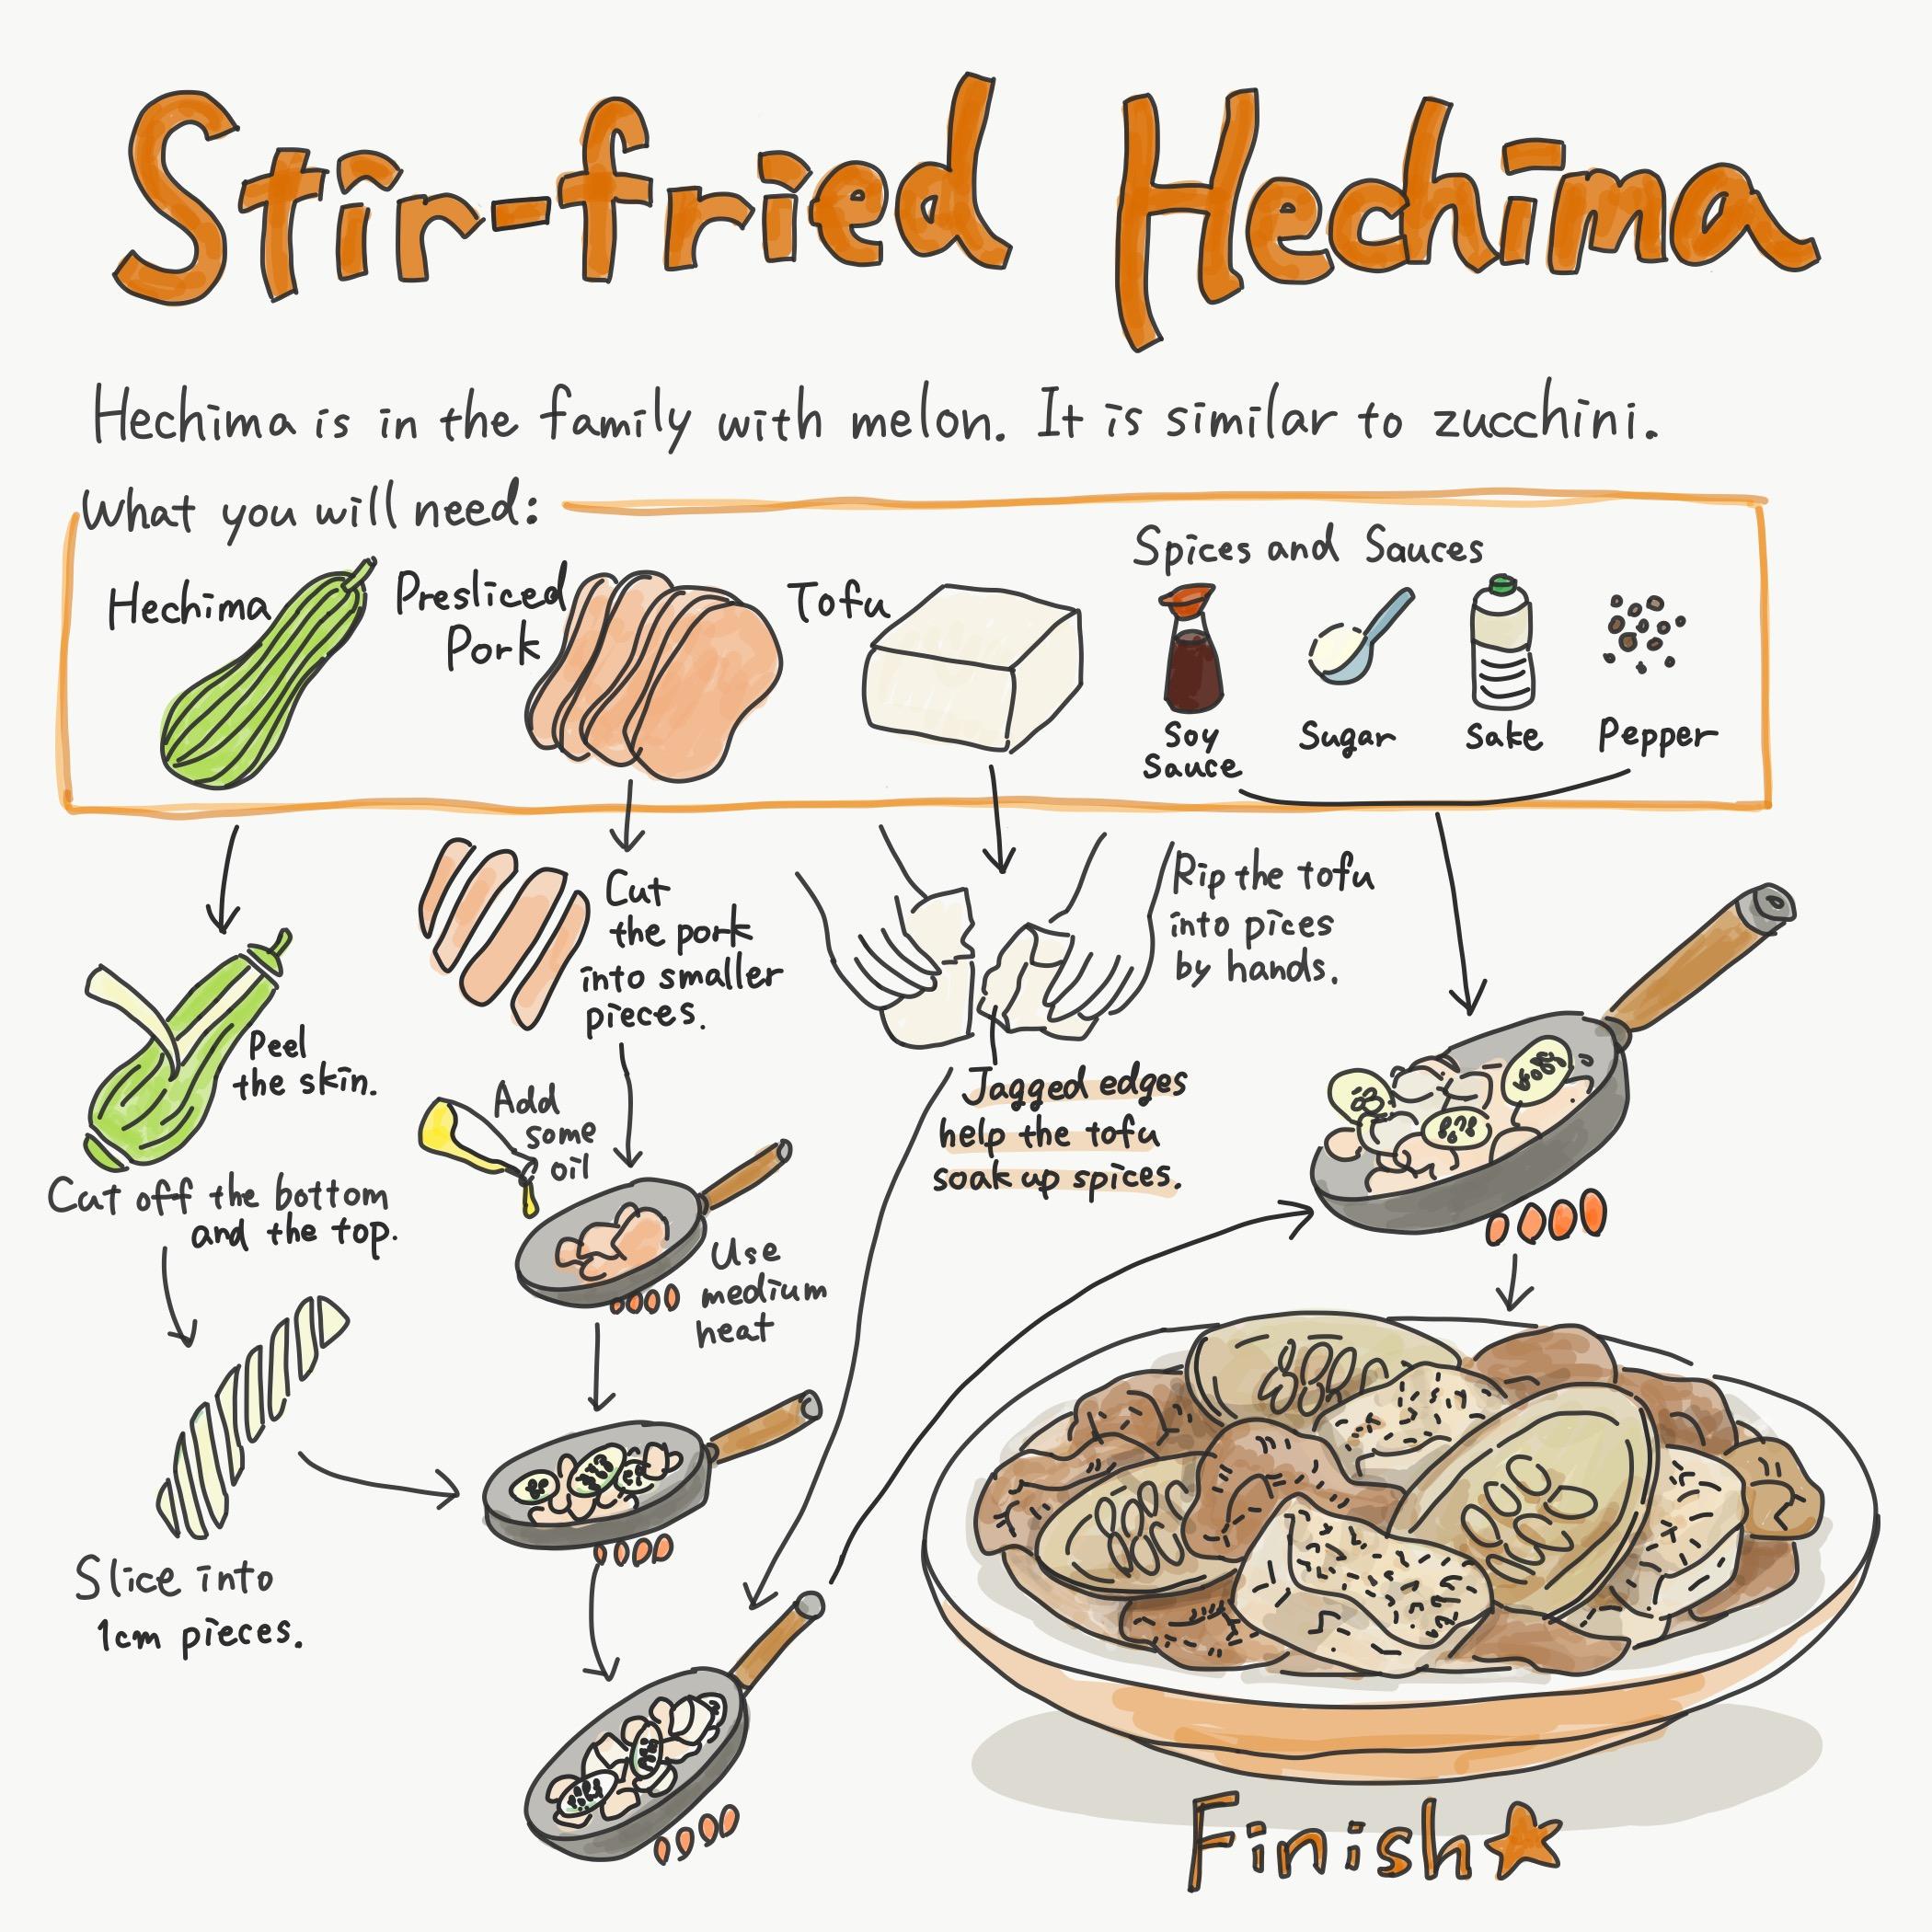 Stir-fried Hechima